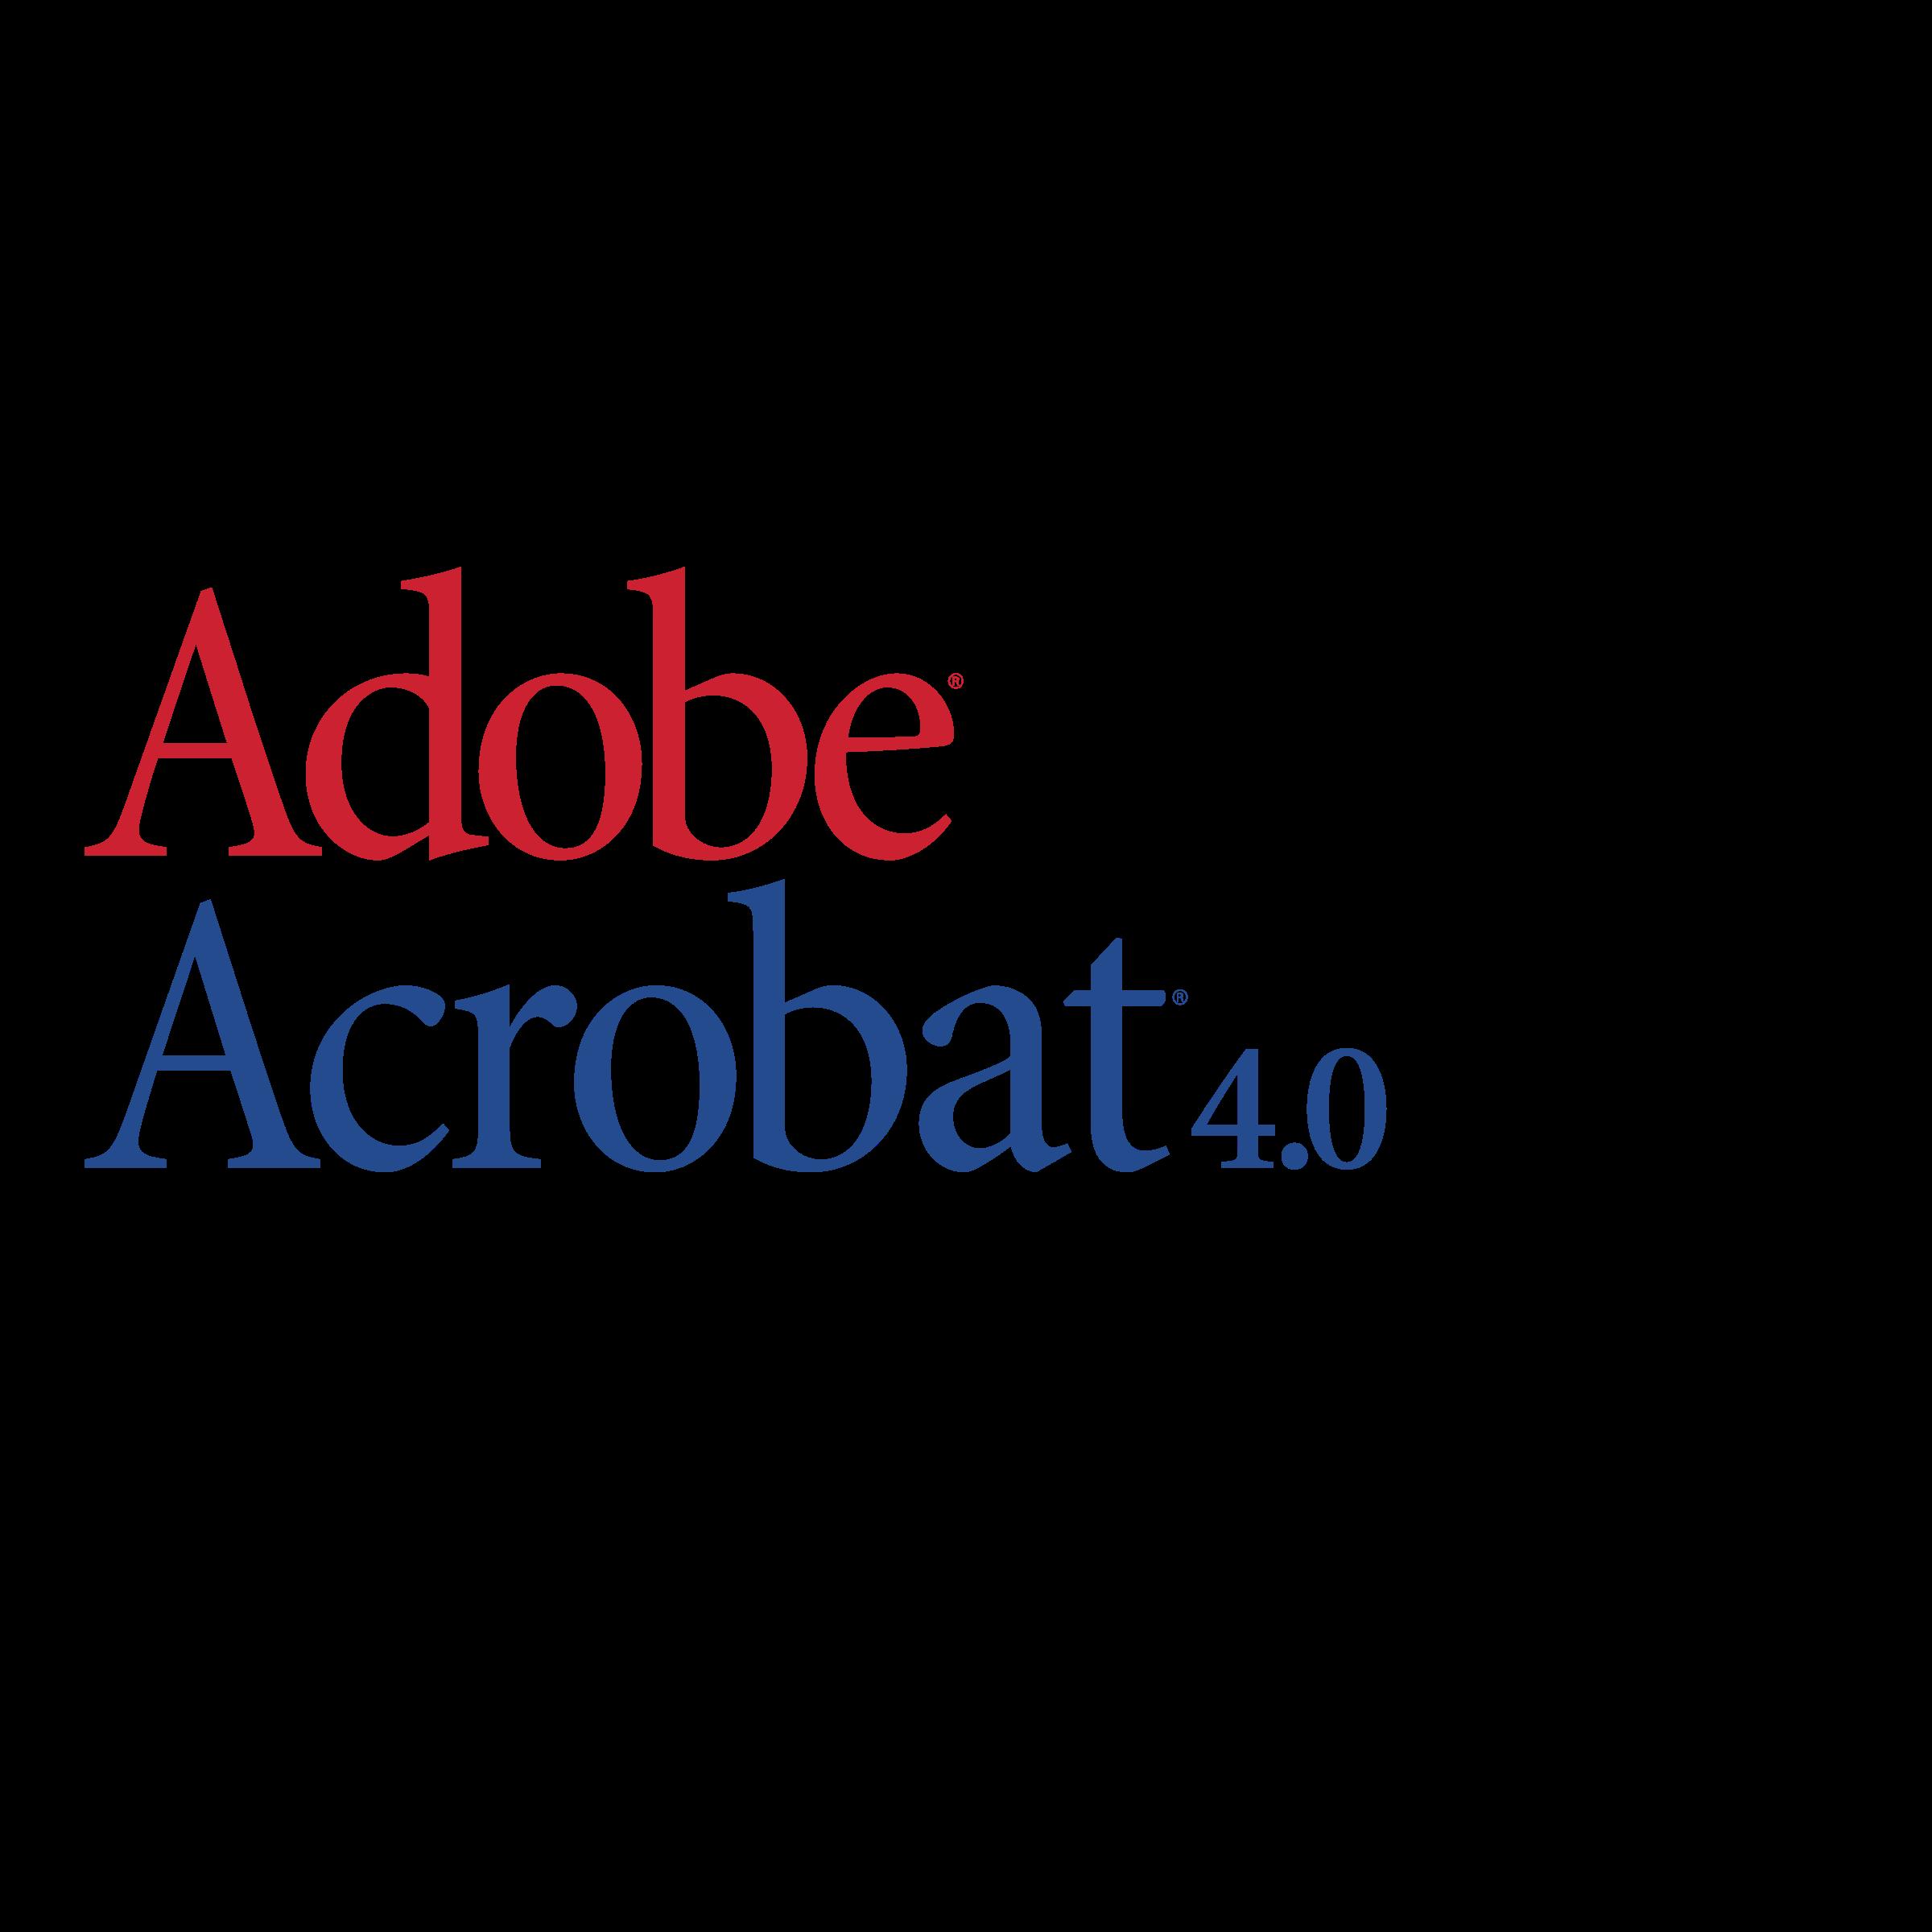 vector free download Adobe Acrobat Logo PNG Transparent